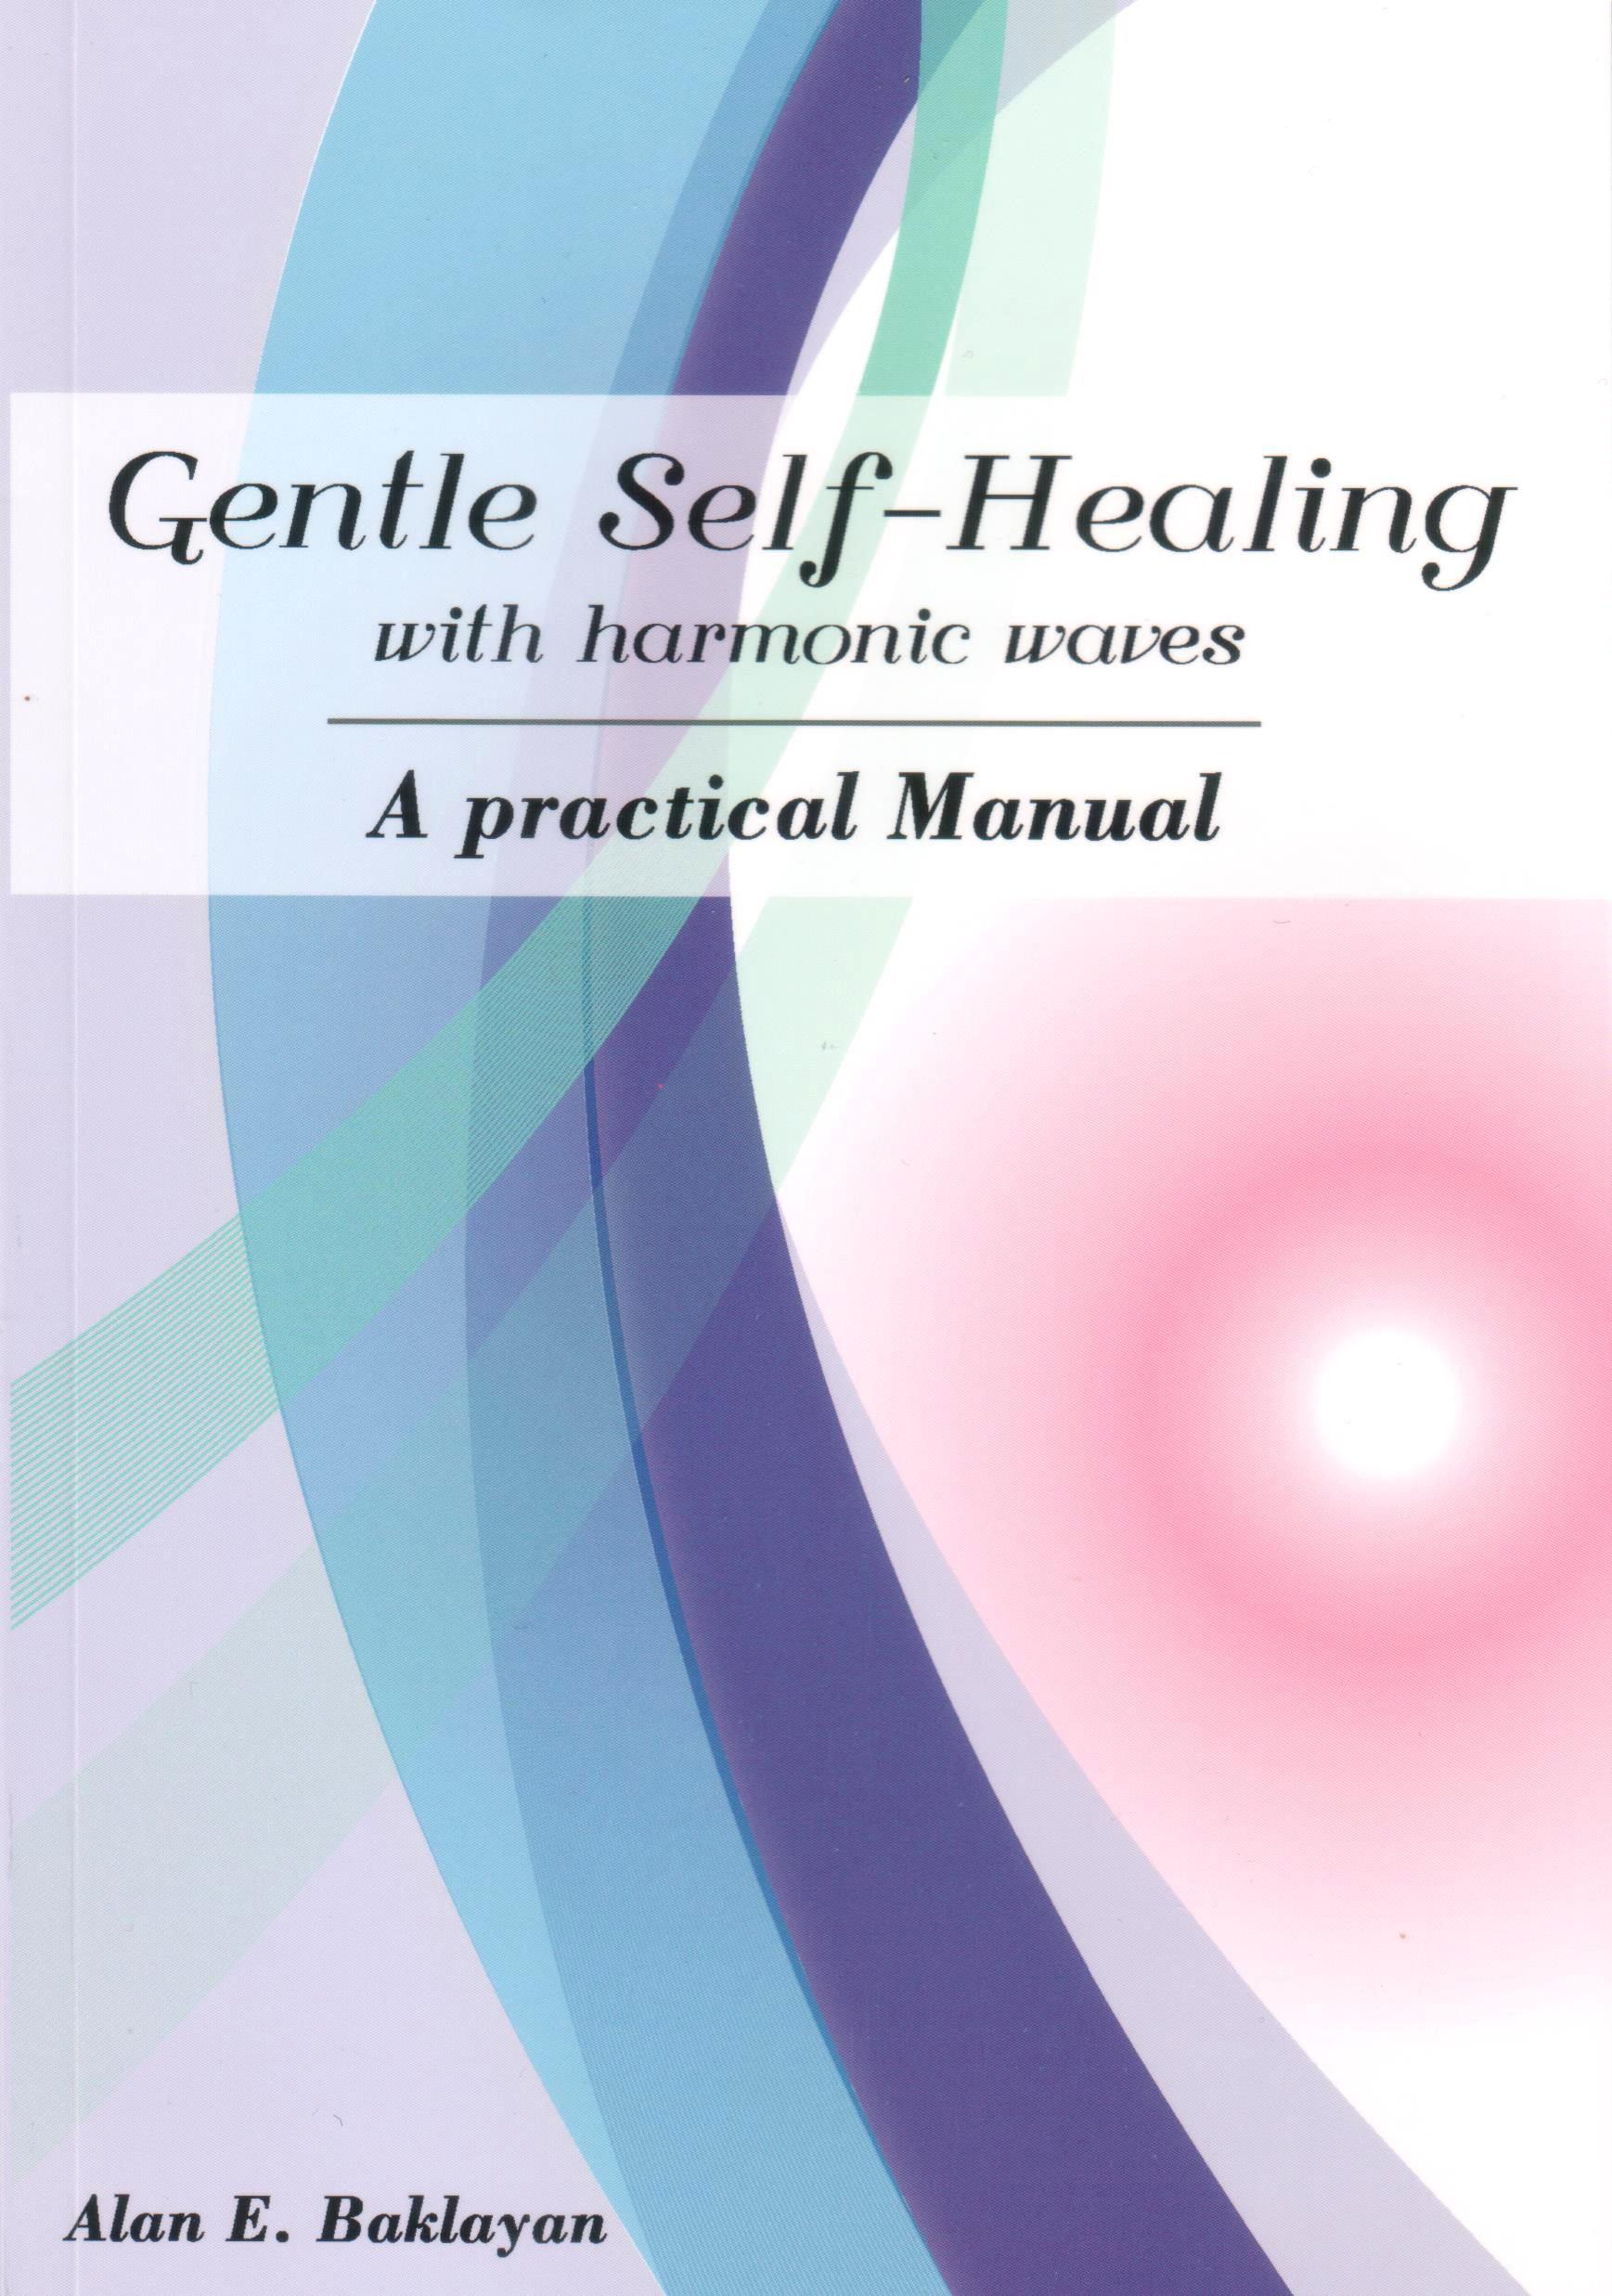 Gentle Self-Healing with harmonic waves - A practical Manual von Alan Baklayan auf englisch